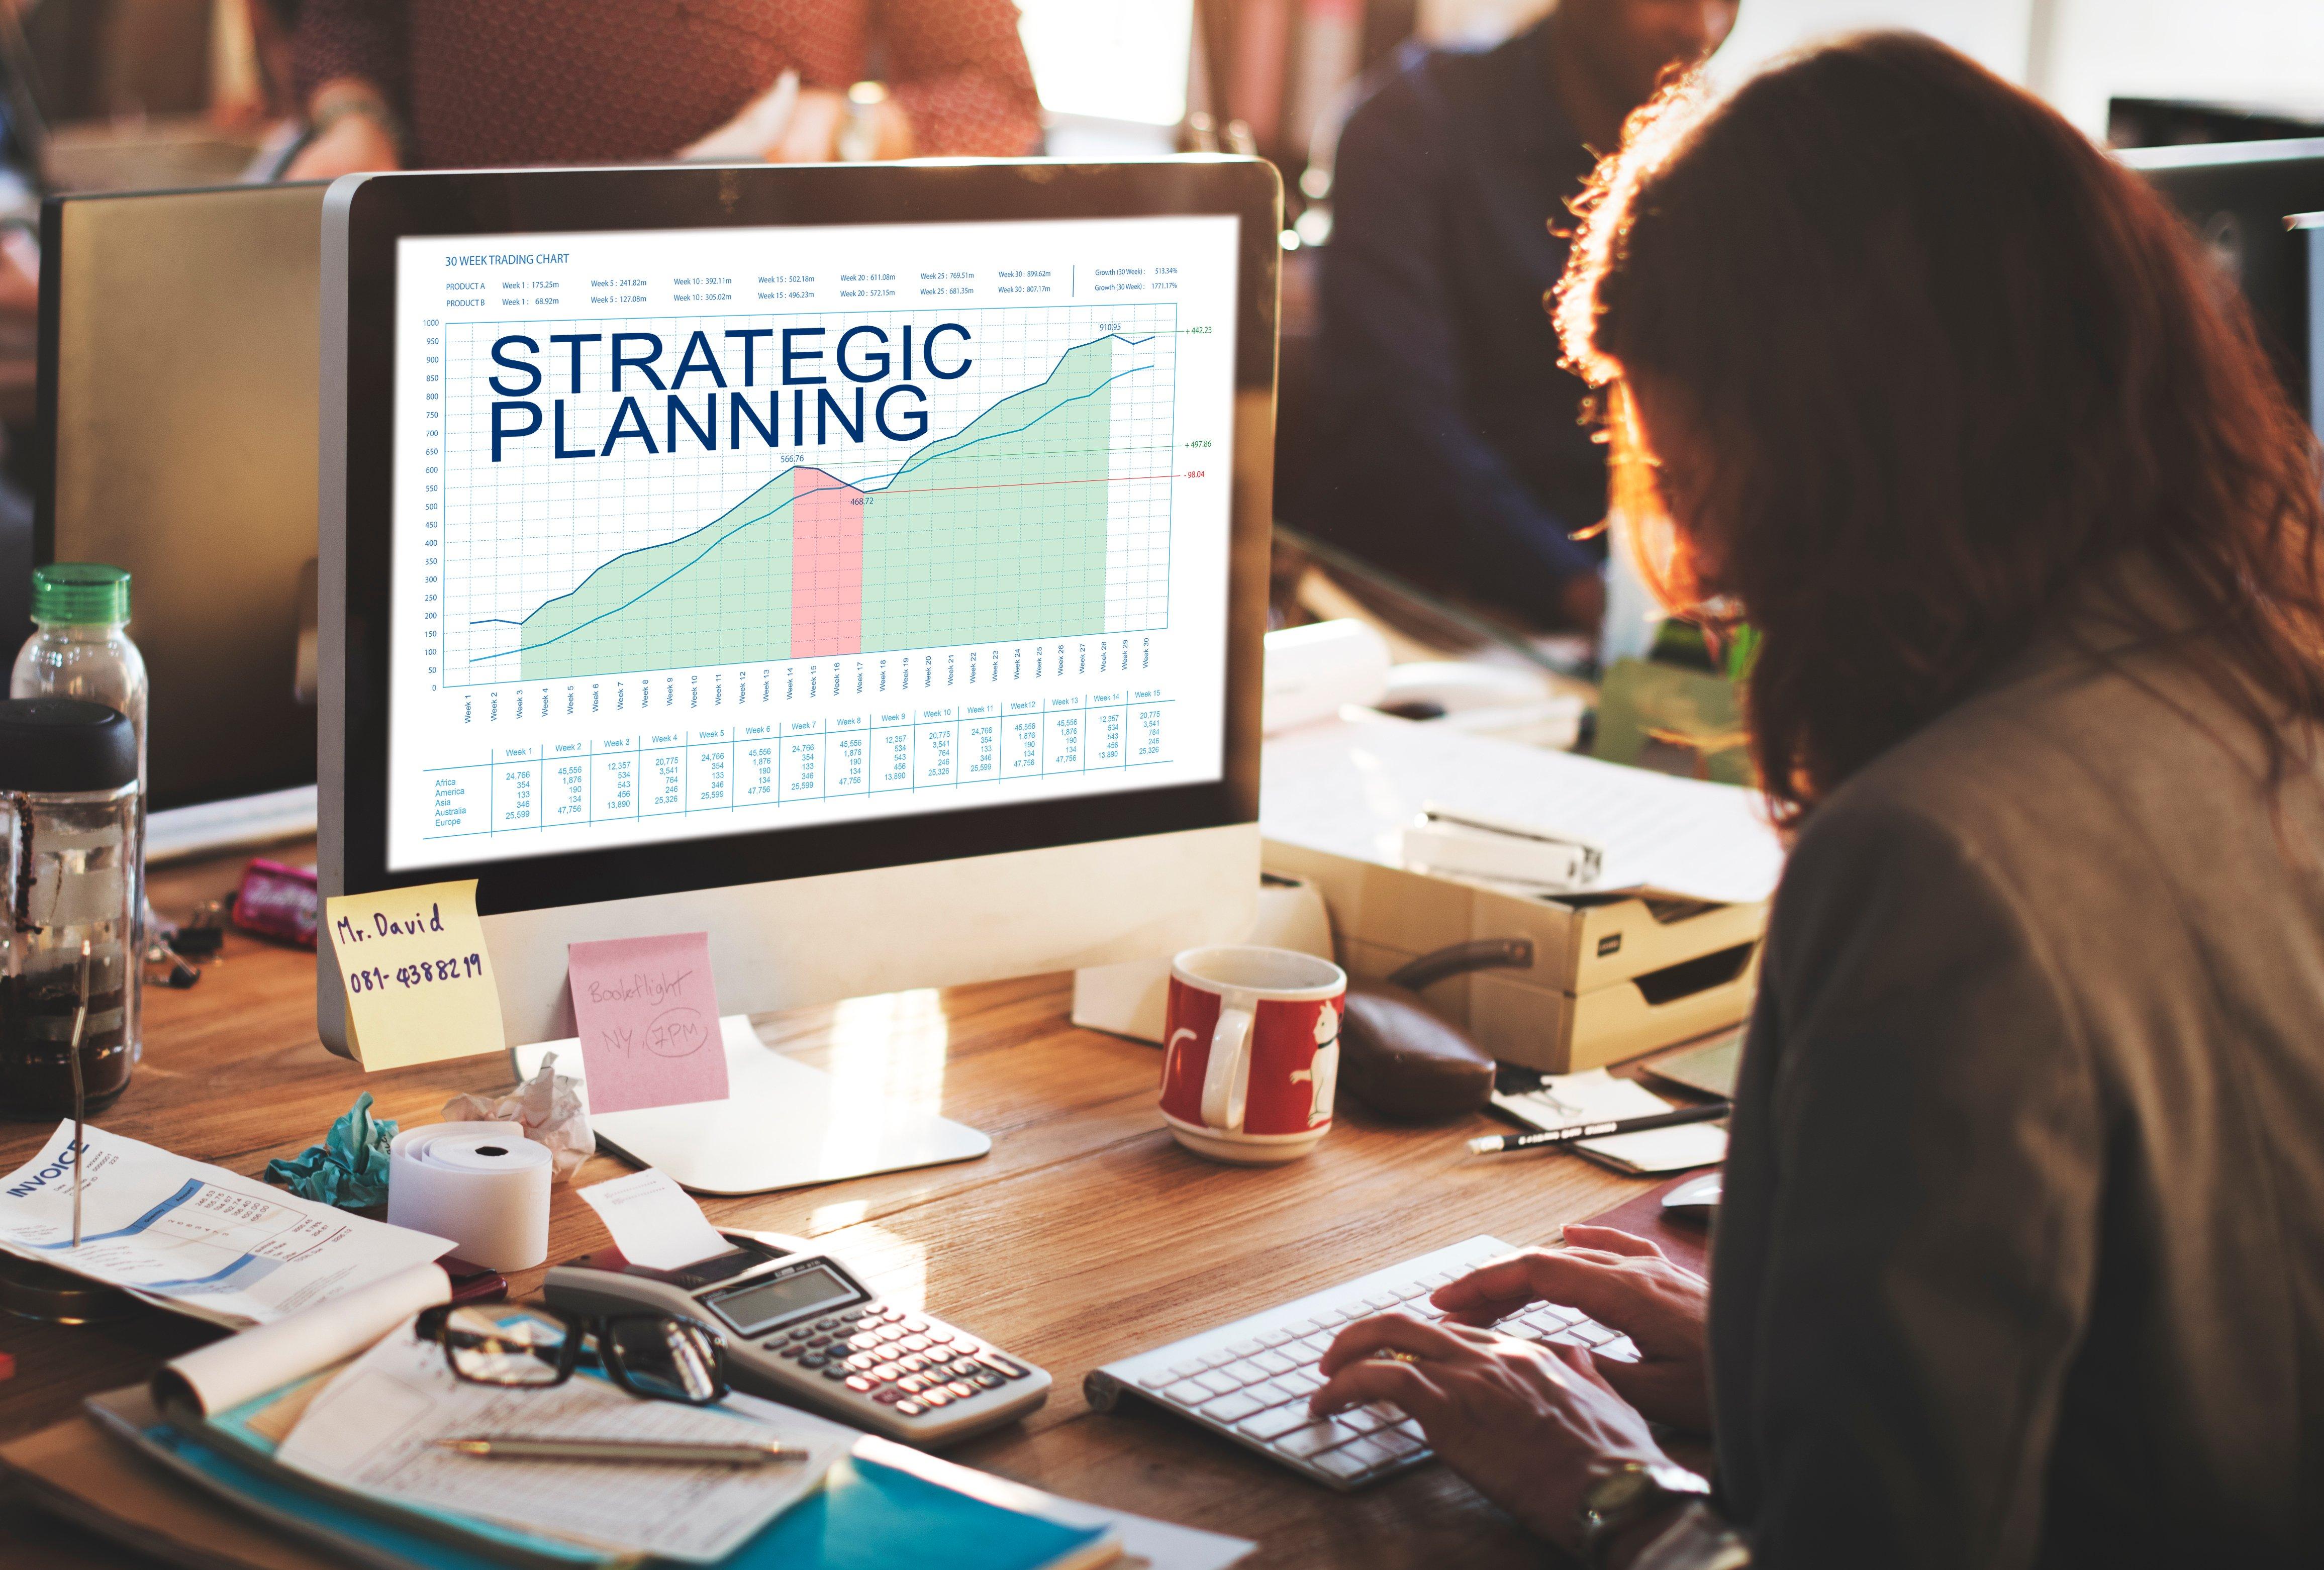 strategic-plan-graphs-business-marketing-goals-con-P8KLT5K